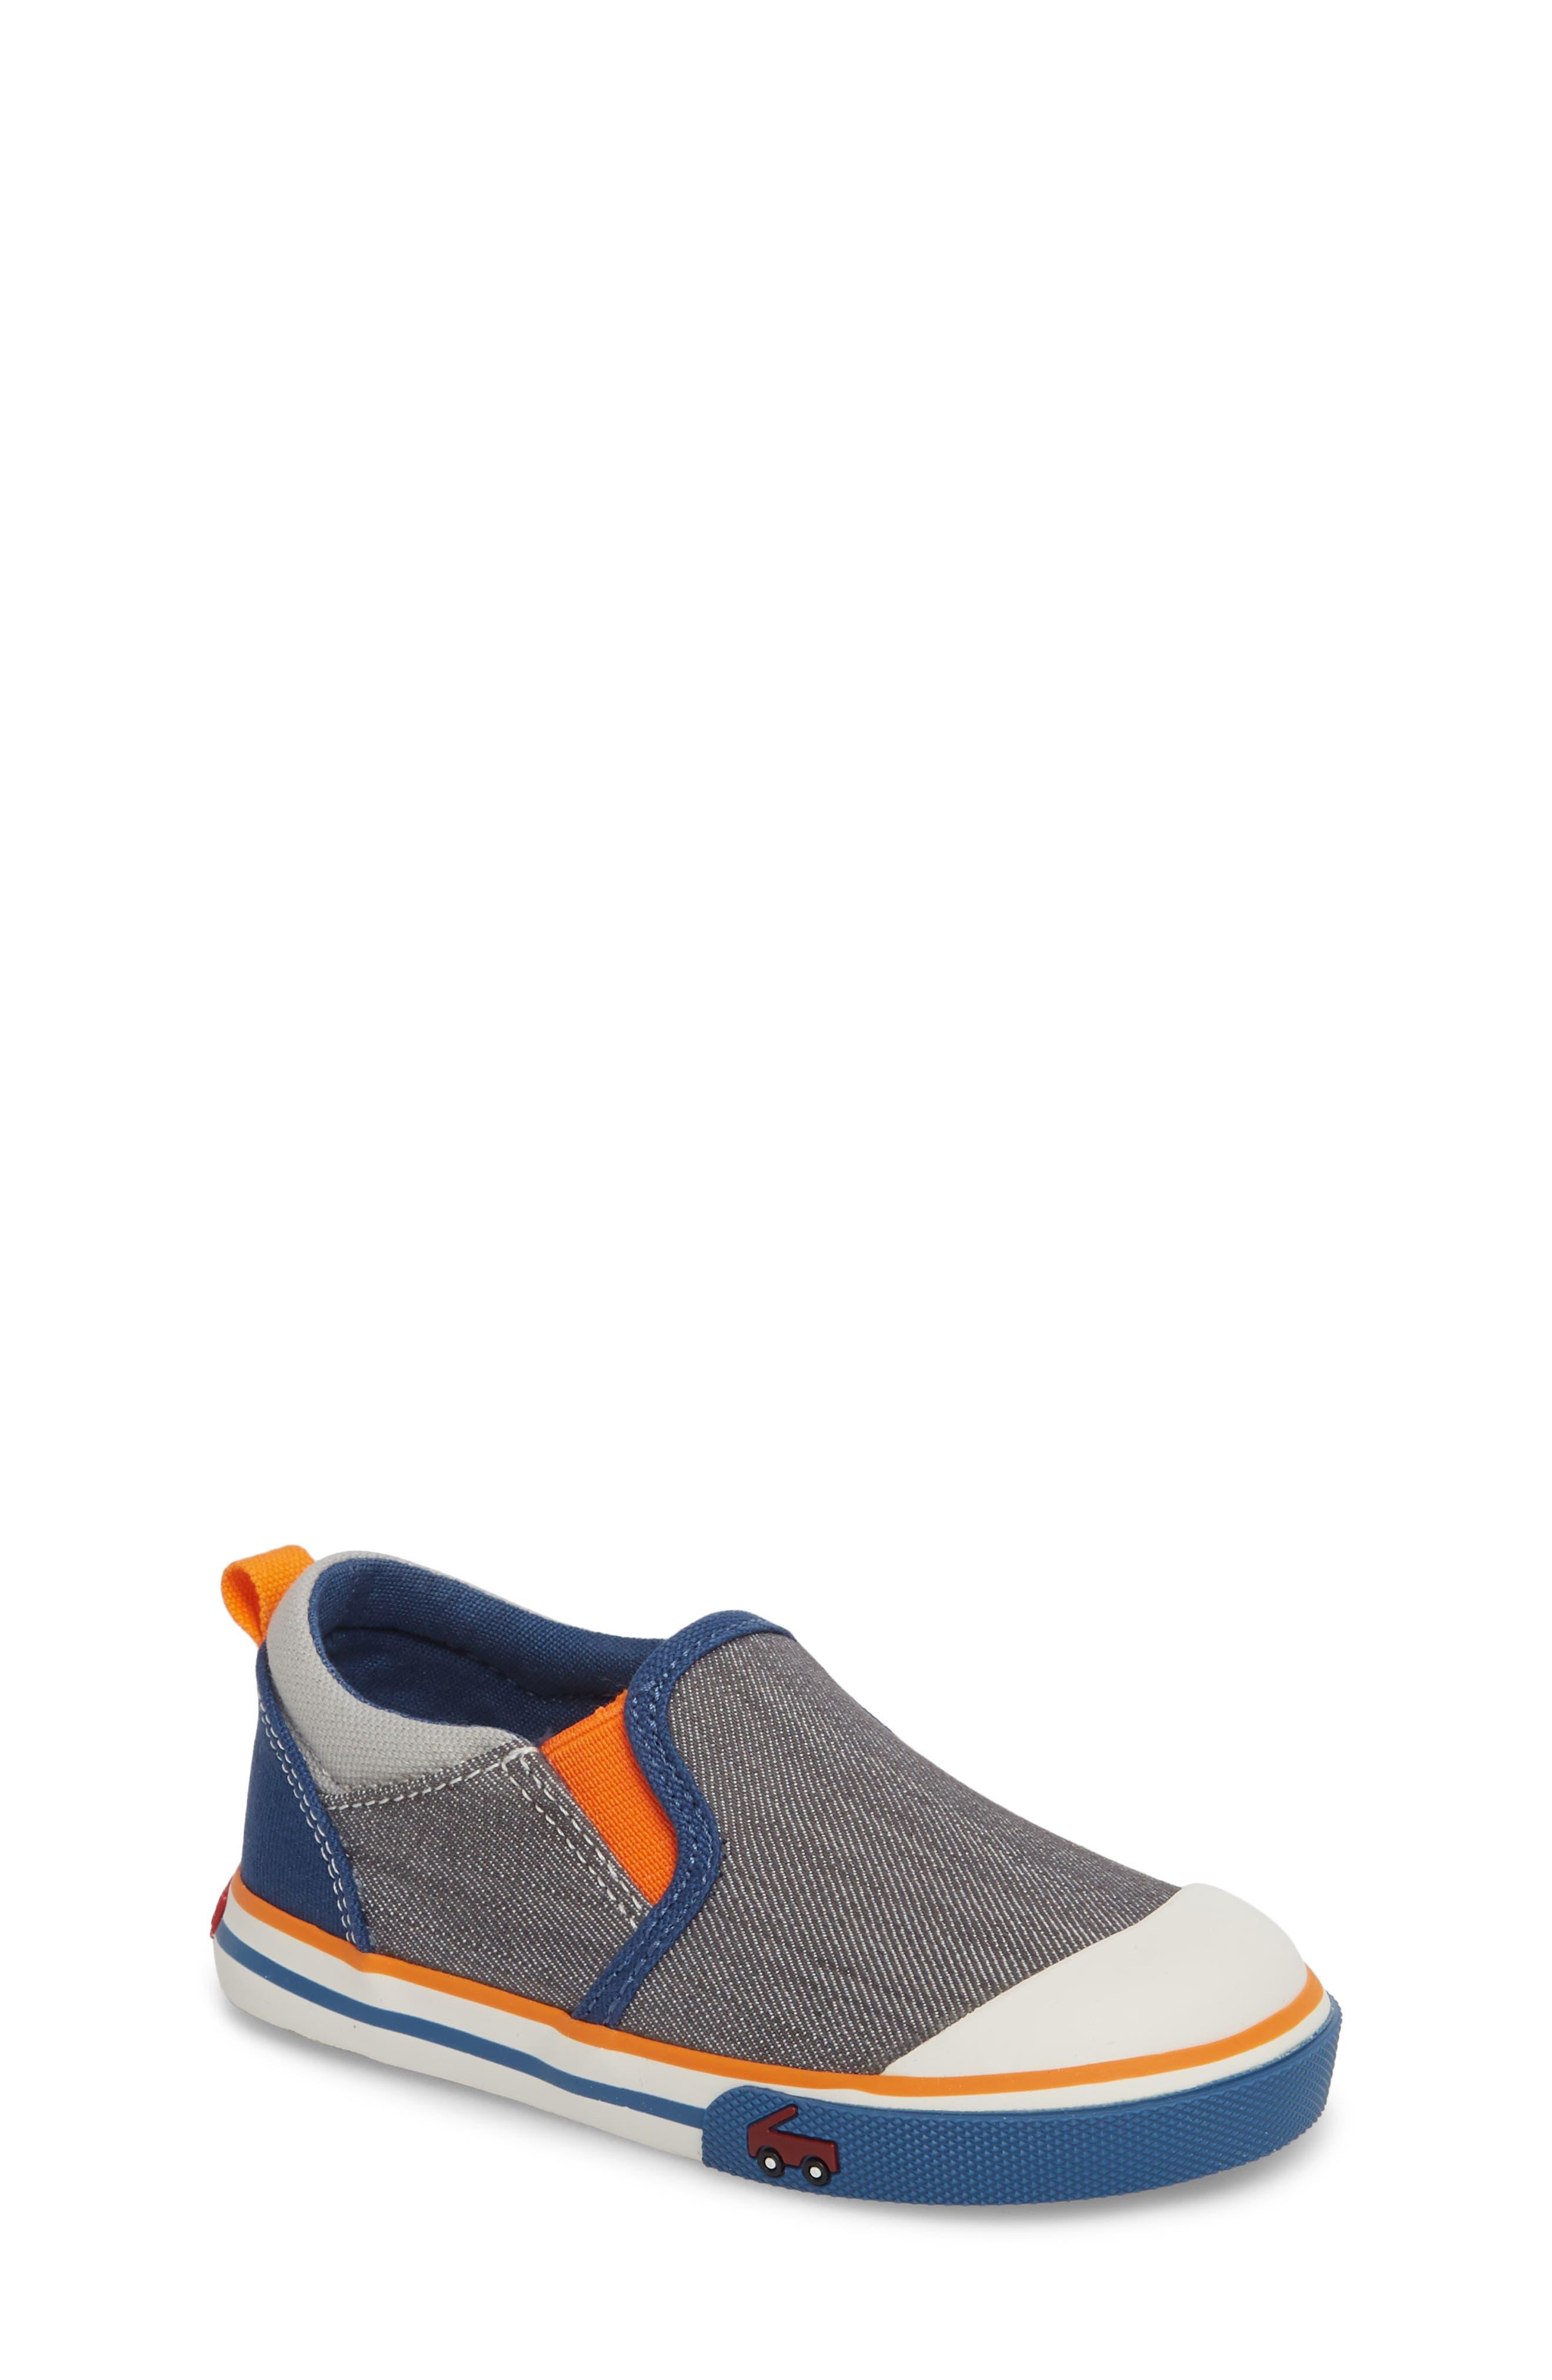 Slater Colorblock Slip-On Sneaker,                             Main thumbnail 1, color,                             Gray/ Blue